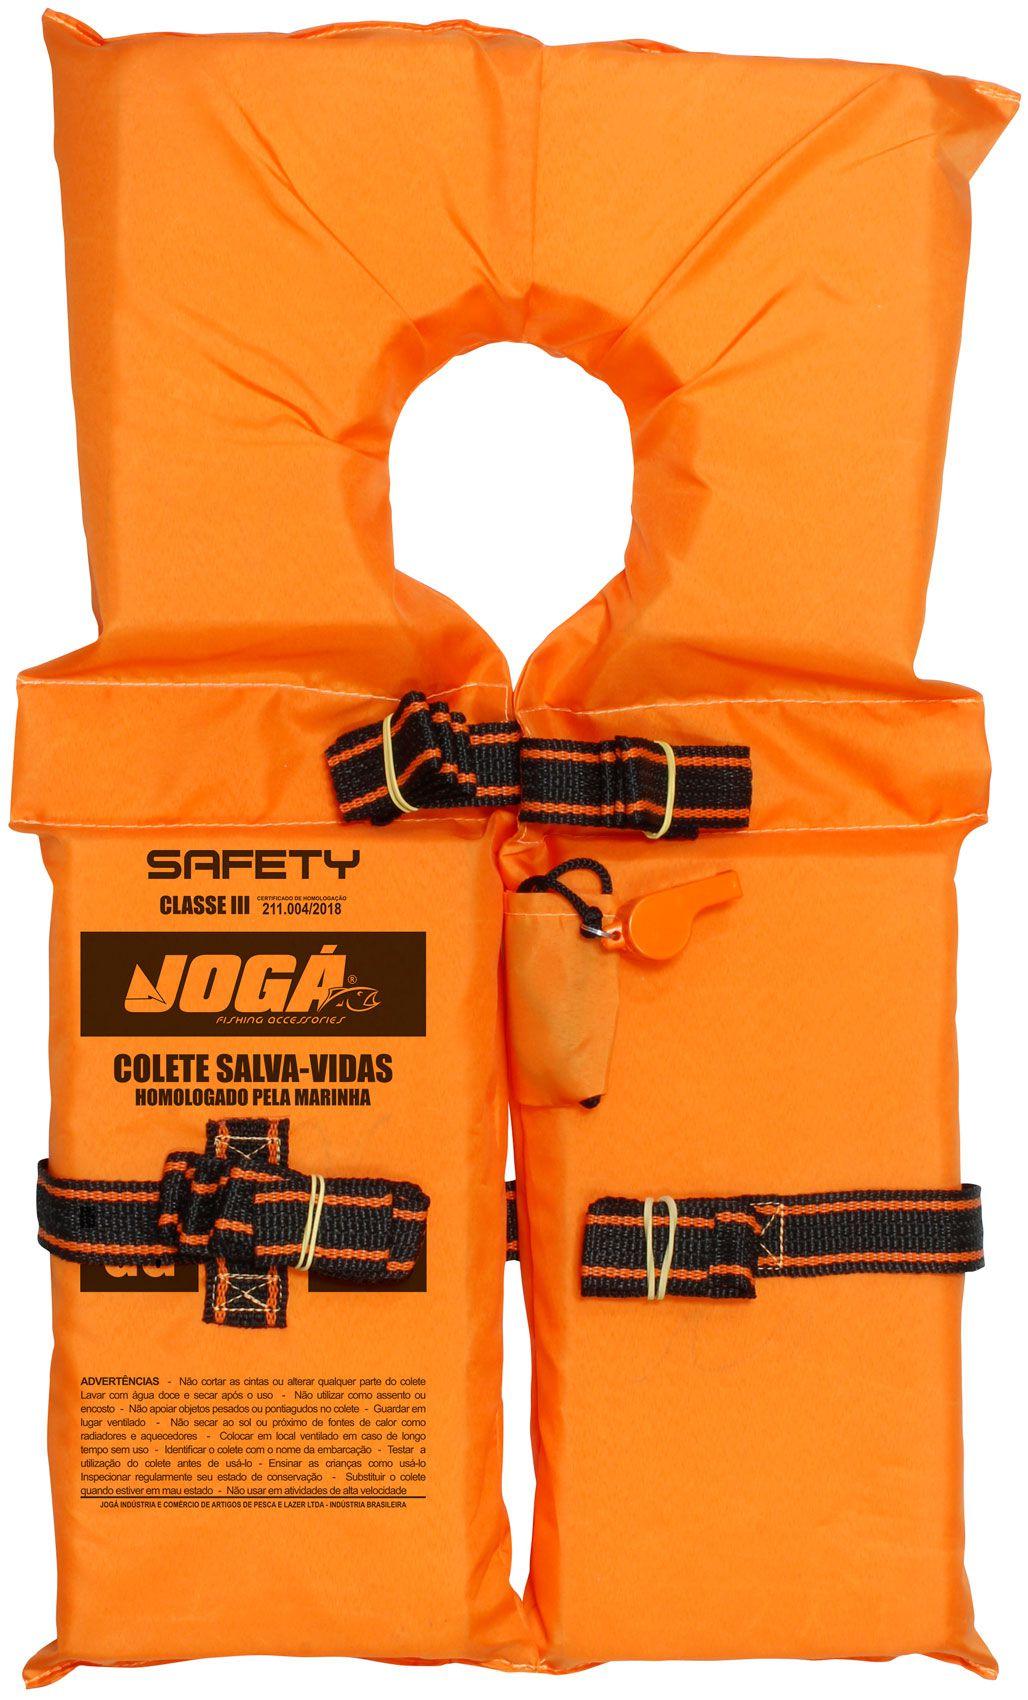 Colete Salva Vidas Jogá Classe 3 Safety Laranja - PP